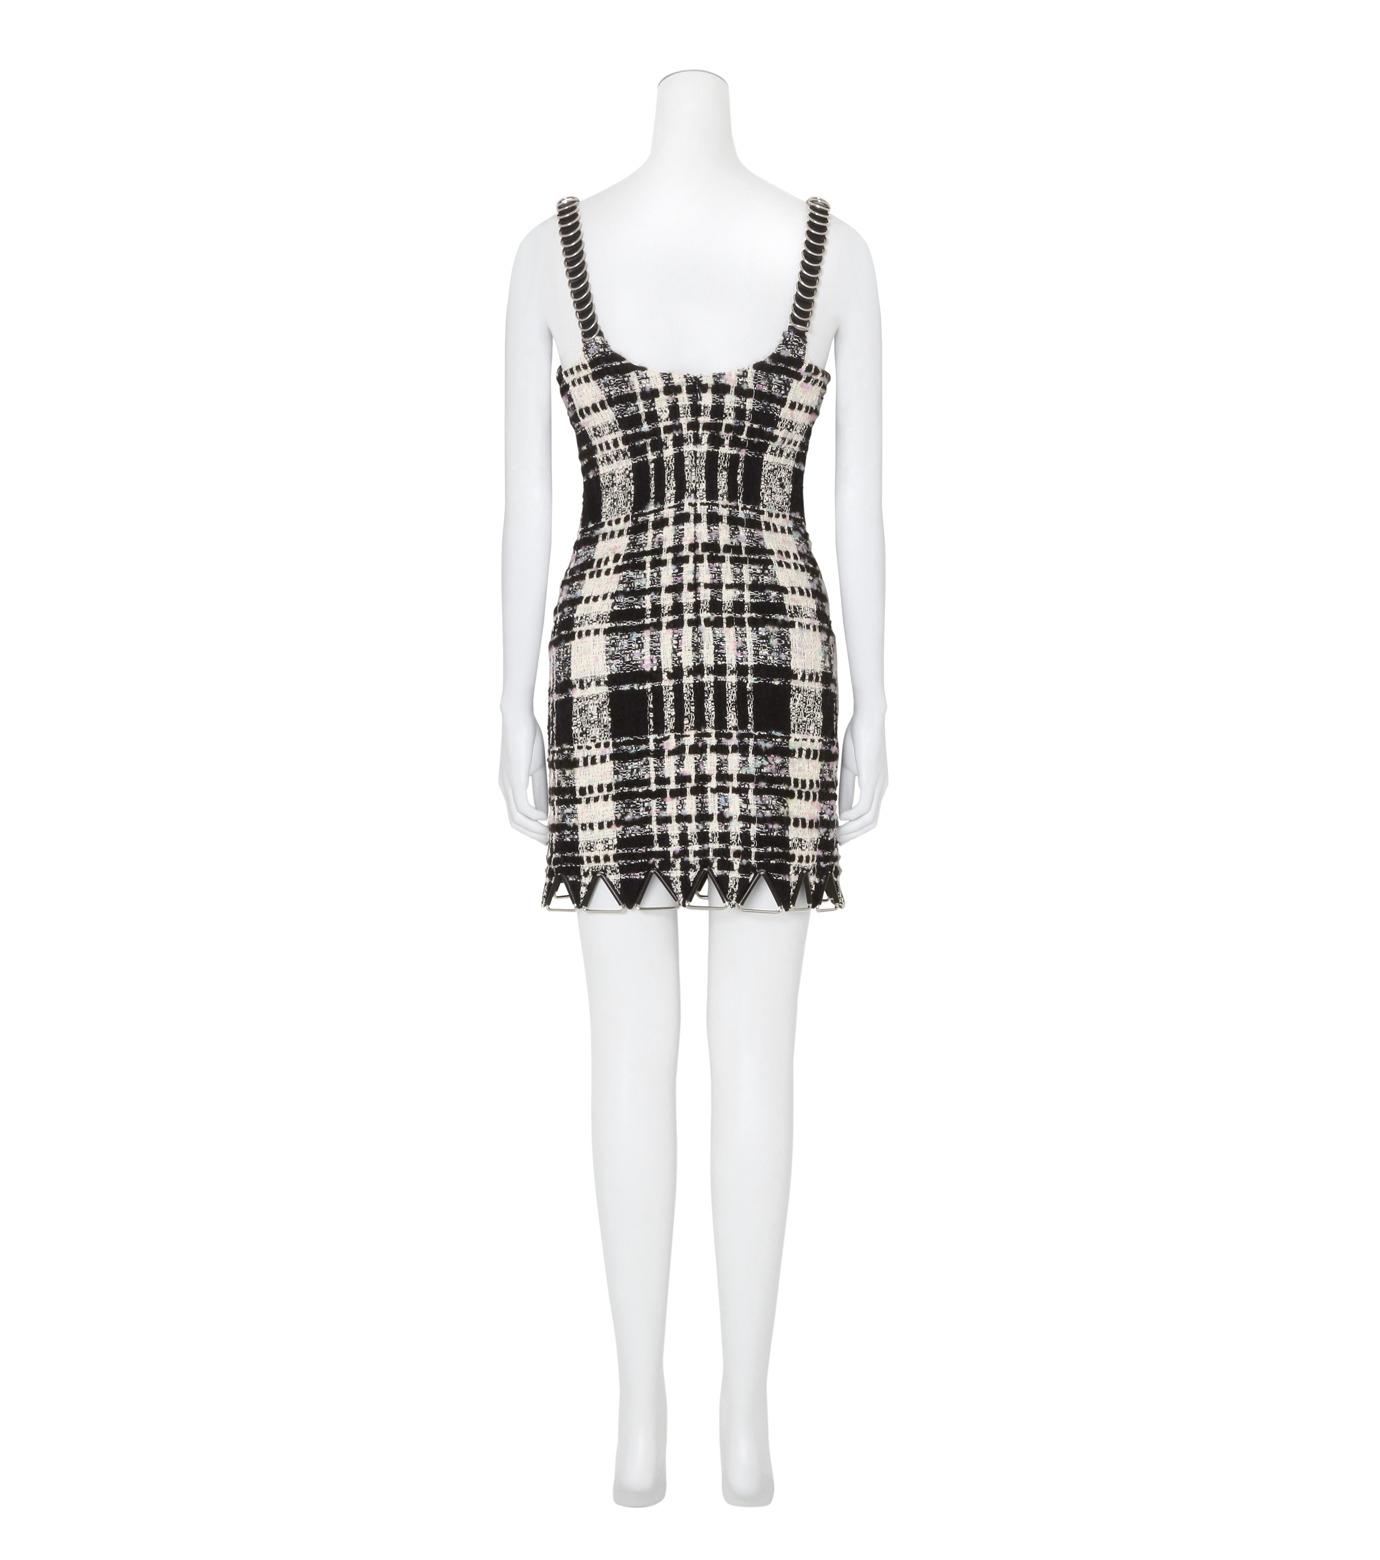 Alexander Wang(アレキサンダーワン)のCami Mini Dress w/Triangle Hardware-BLACK(ワンピース/one piece)-106908F16-13 拡大詳細画像2